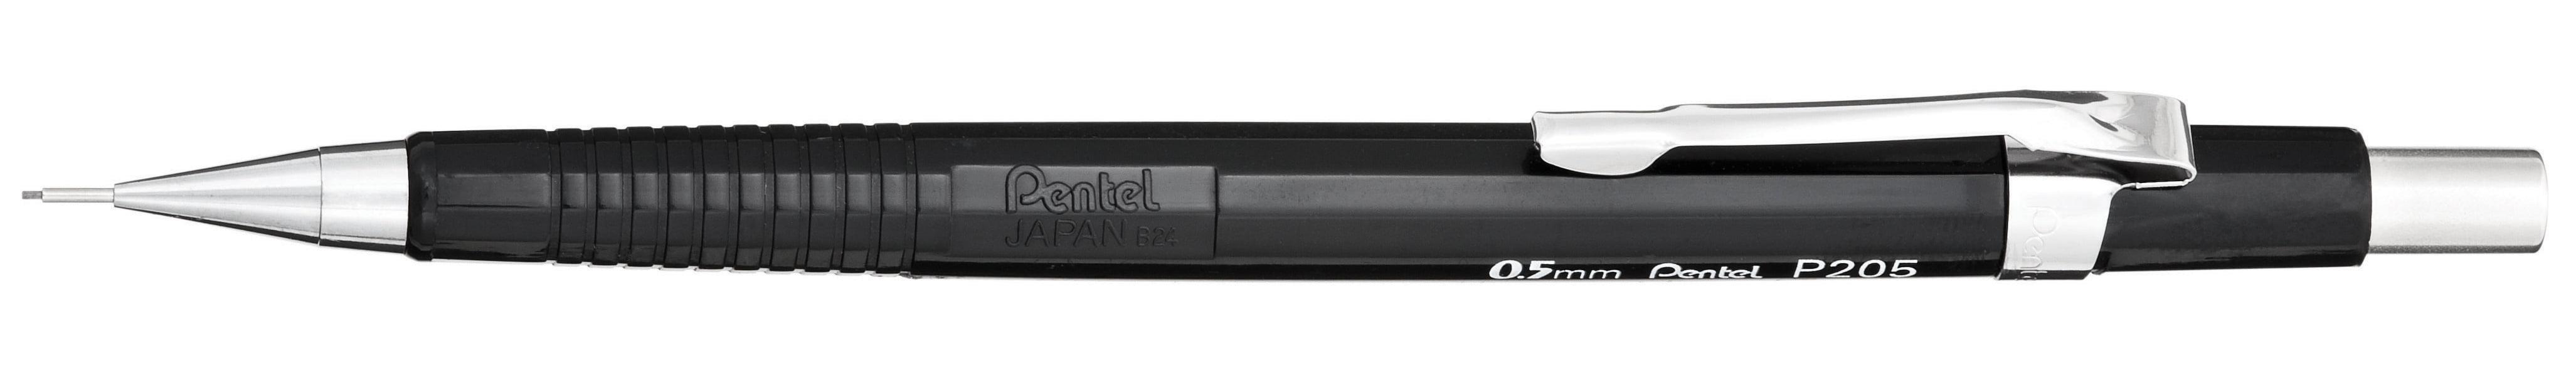 Pentel Sharp Mechanical Drafting #2 Pencil, 0.5 mm, Black Barrel